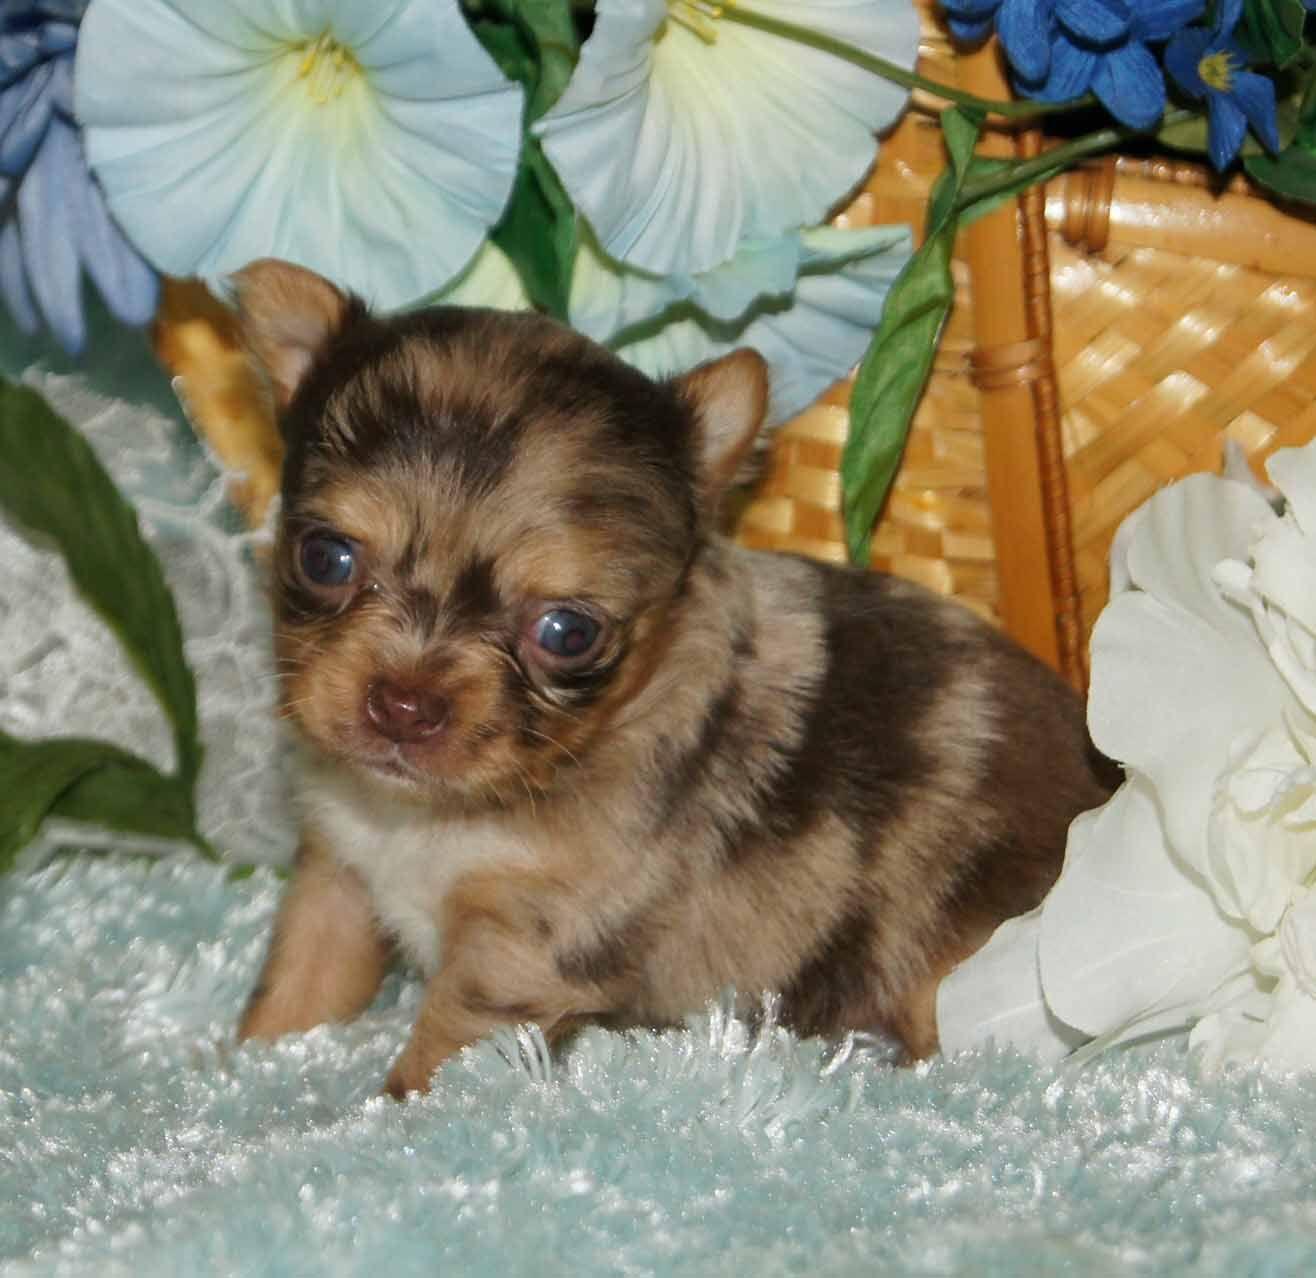 Great Chocolate Brown Adorable Dog - 1f02f8623215f4176b13f675d82549c7  2018_386739  .jpg